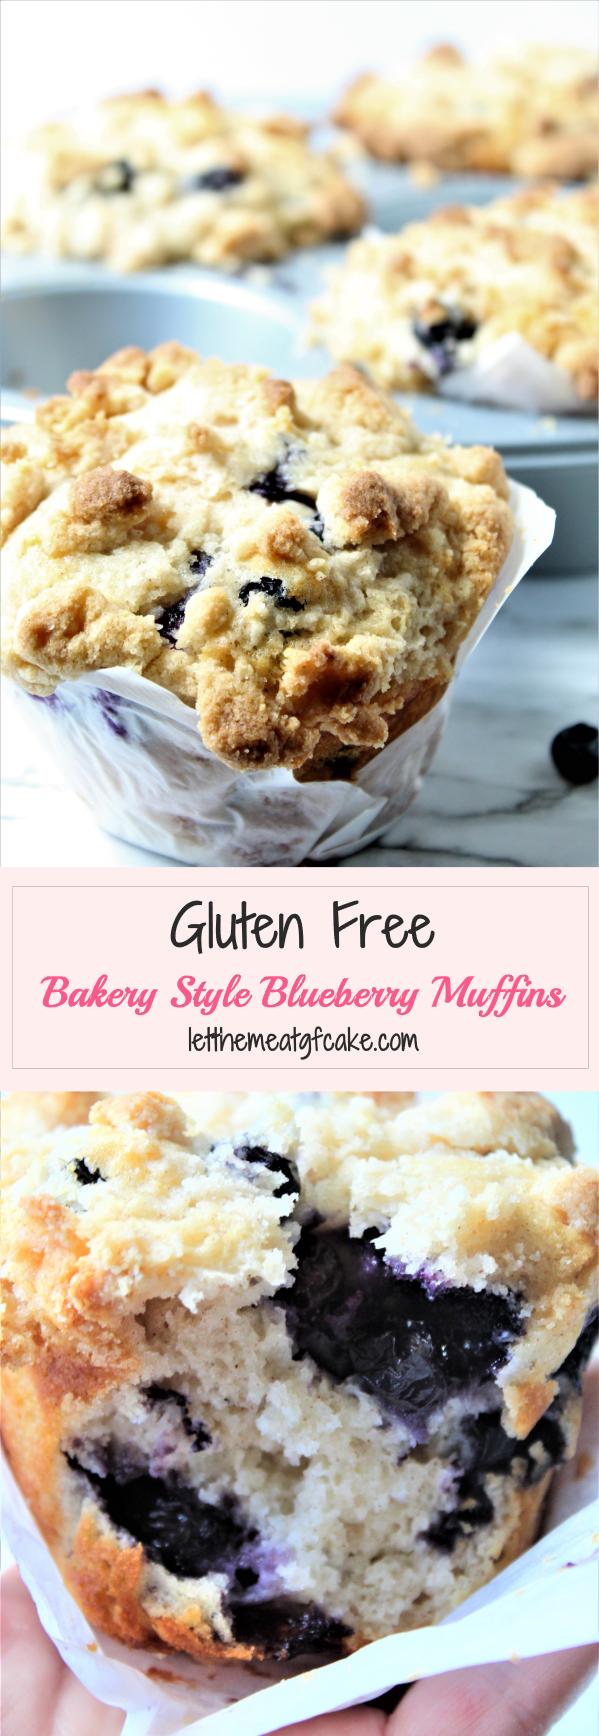 Gluten Free Bakery Style Blueberry Muffins #glutenfreebreakfasts